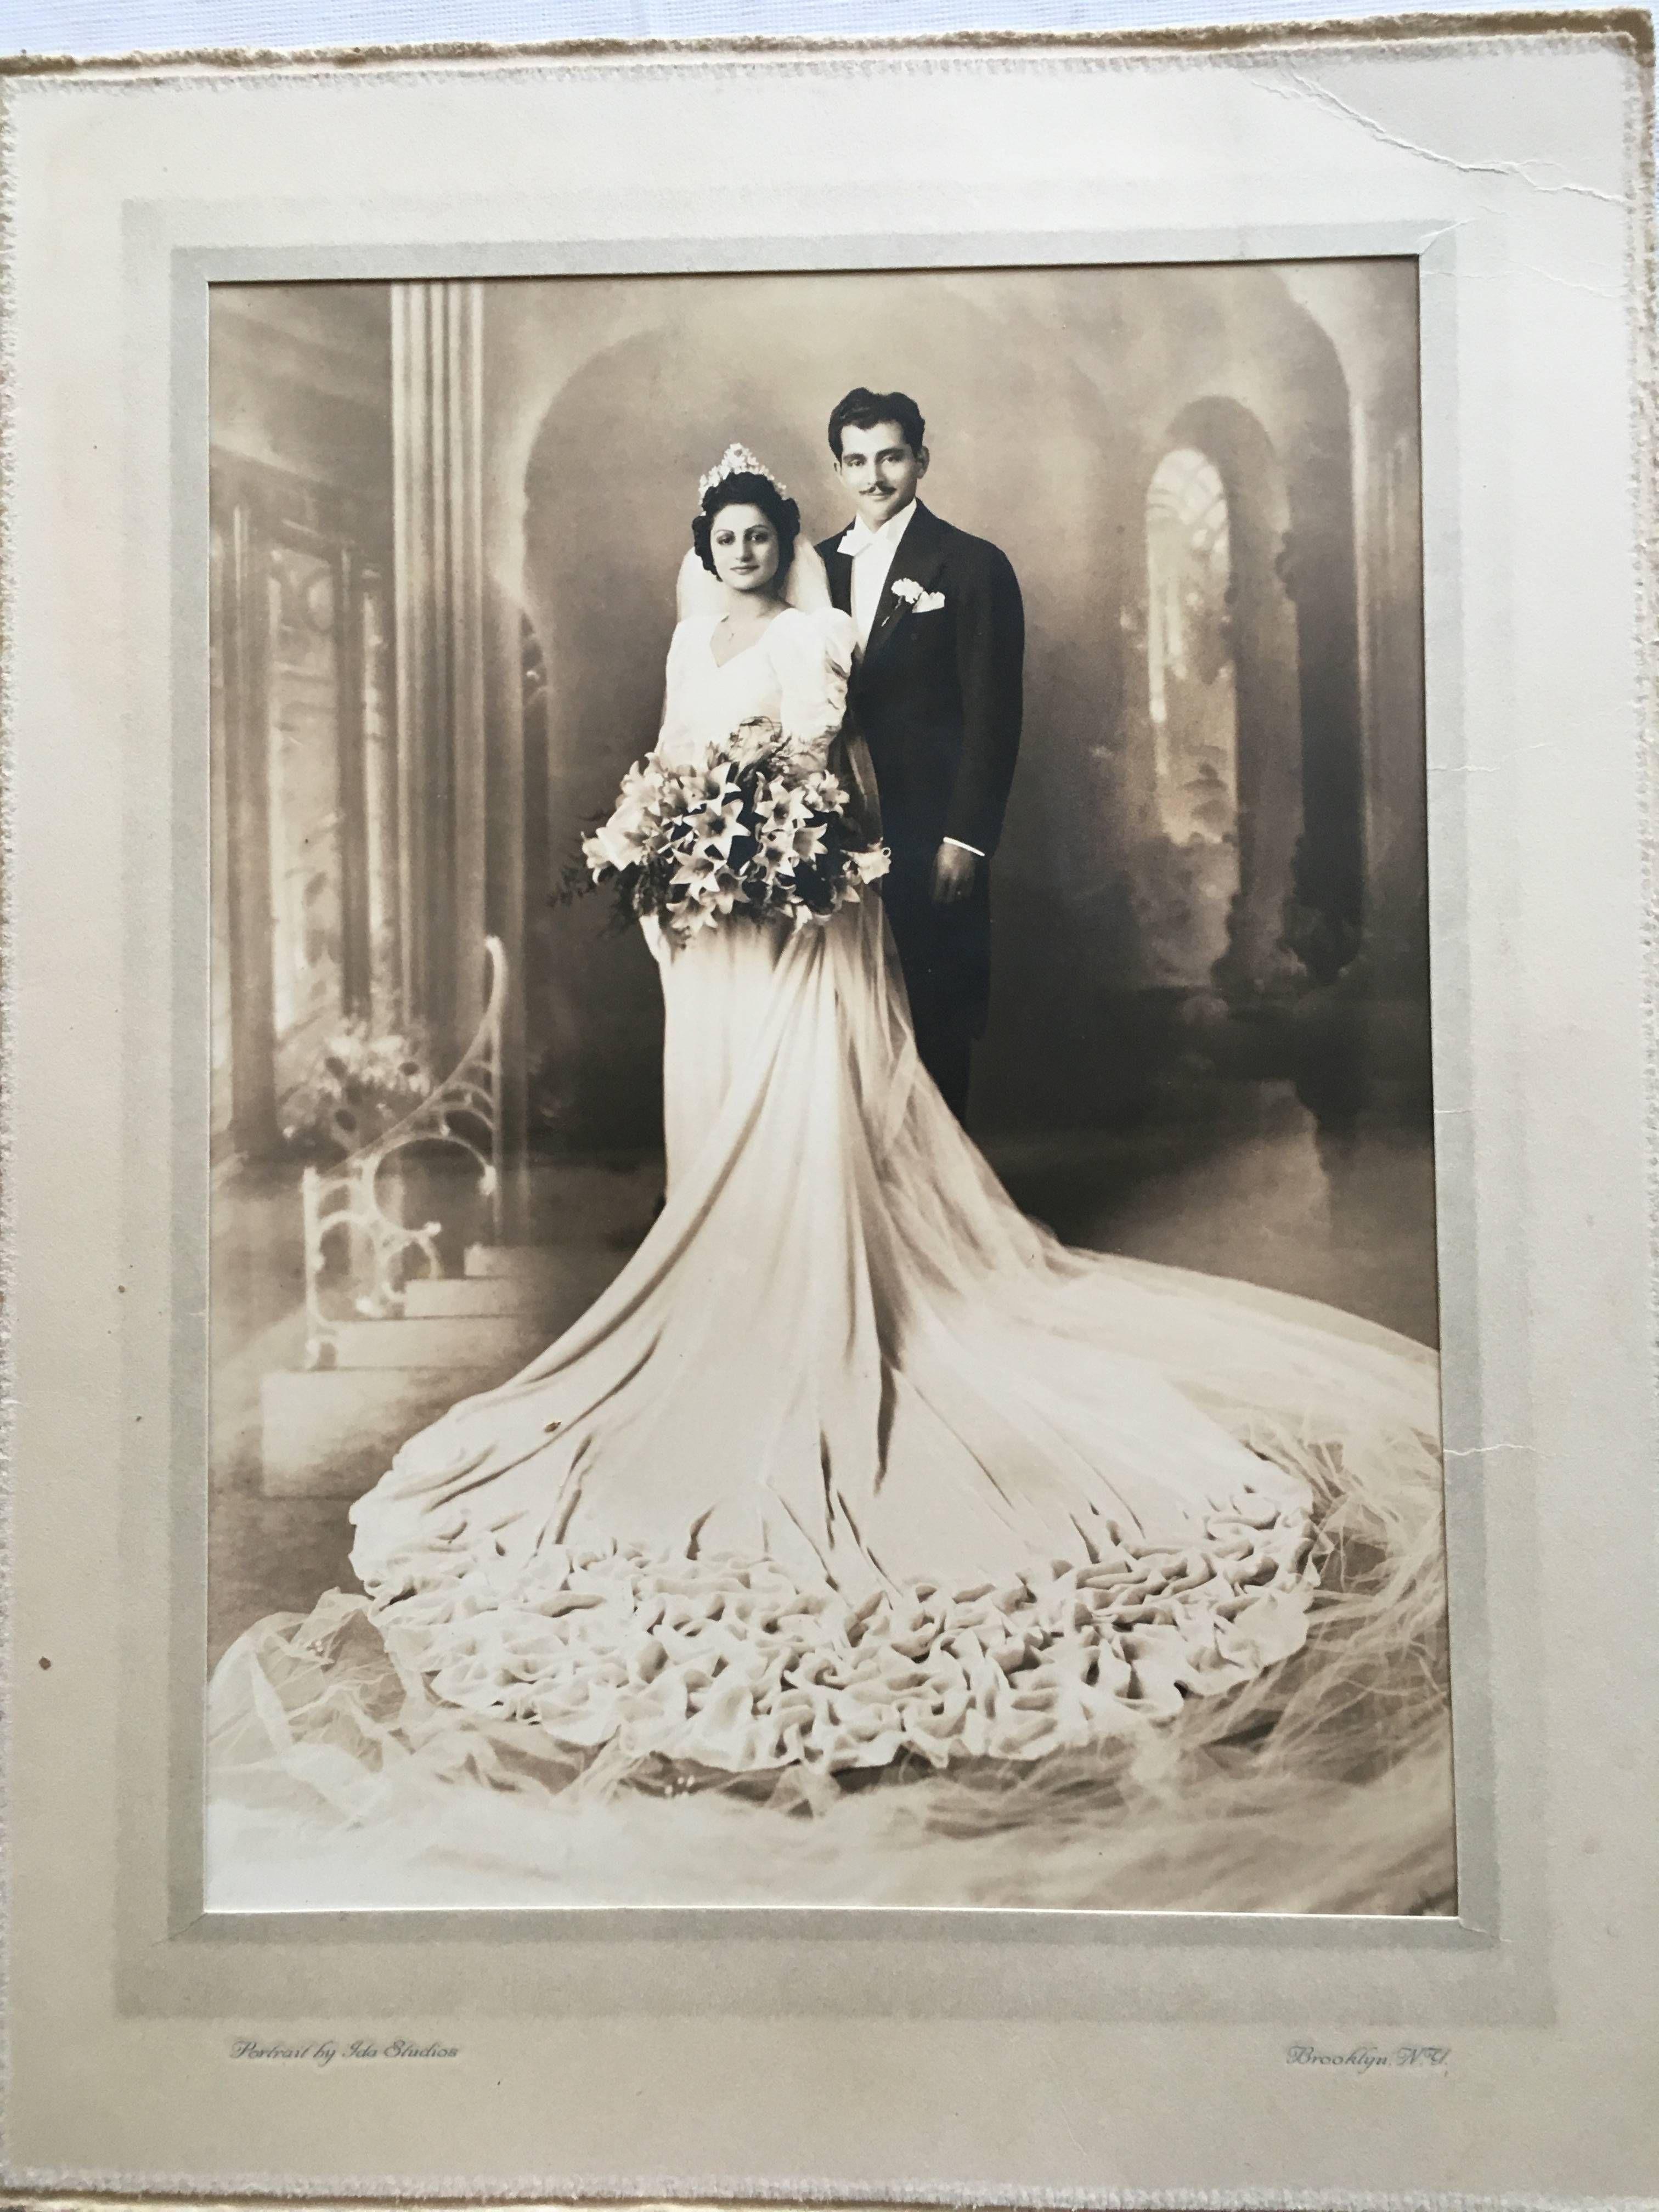 Wedding Portrait, Brooklyn, NY in the 1920s | Vintage Weddings ...